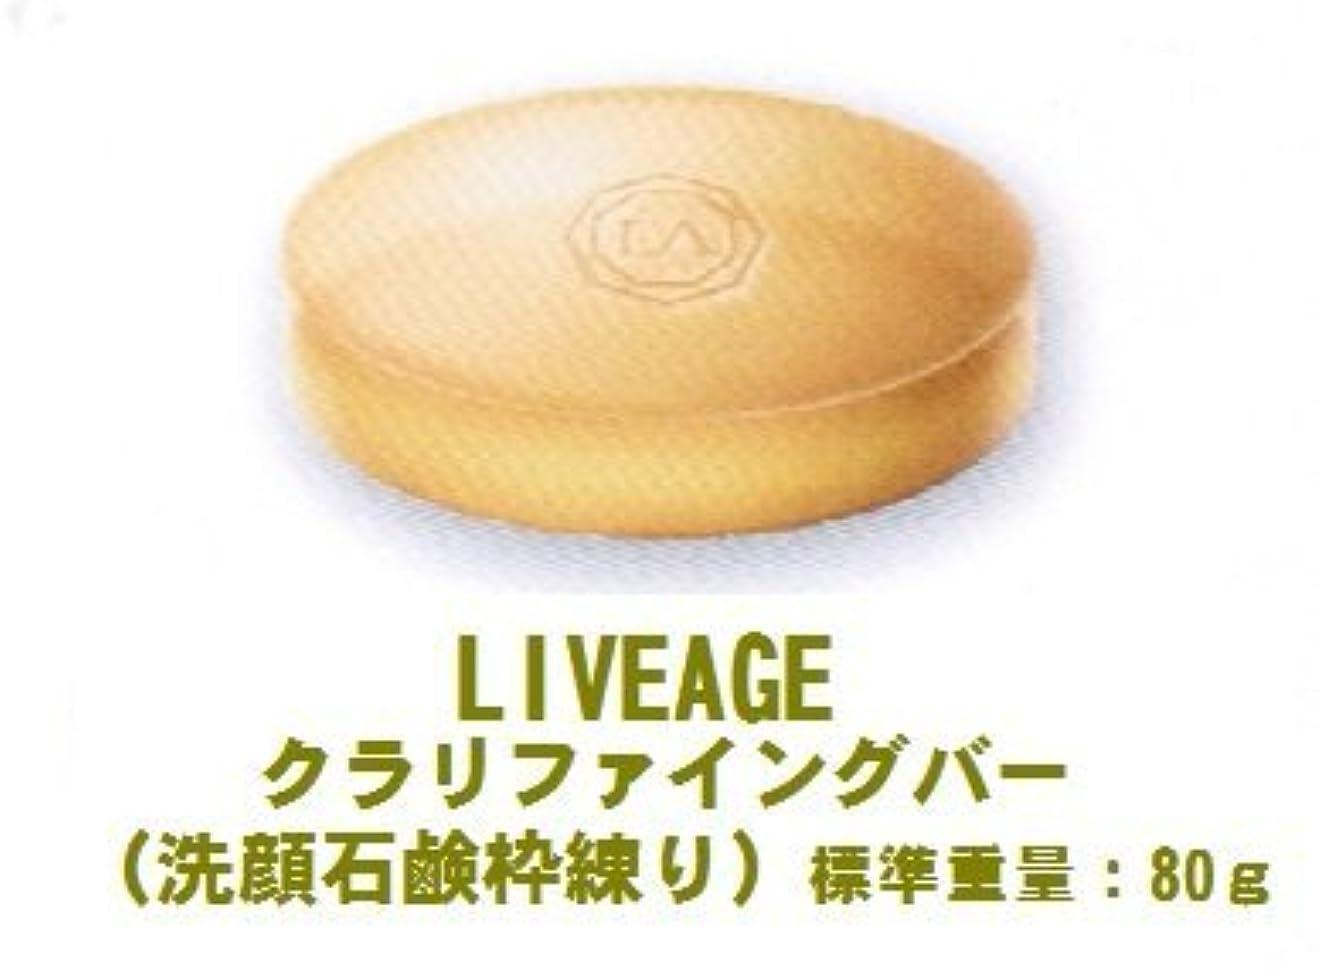 LIVEAGE(ライヴァージュ)クラリファイング バー(洗顔石鹸 枠練り)標準重量80g